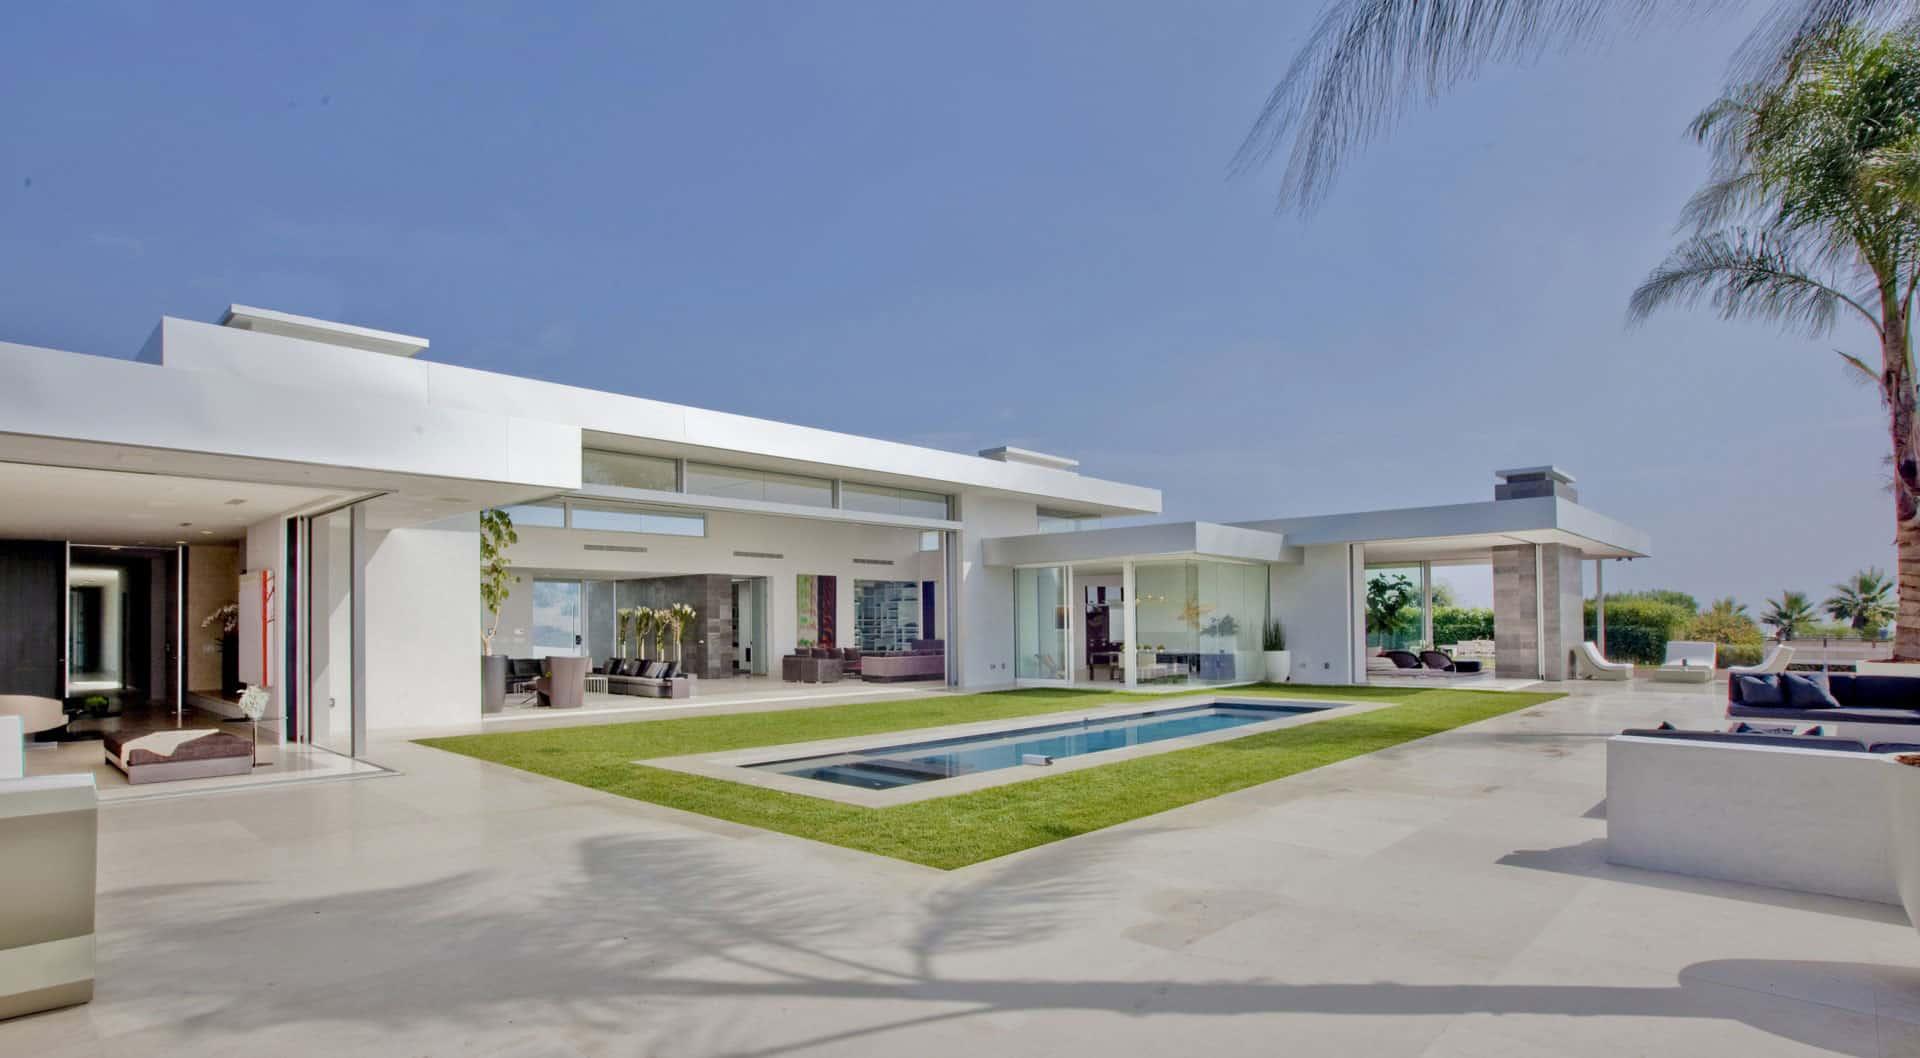 prefab concrete home designs trend home design decor modern concrete homes designs plans trend home design decor